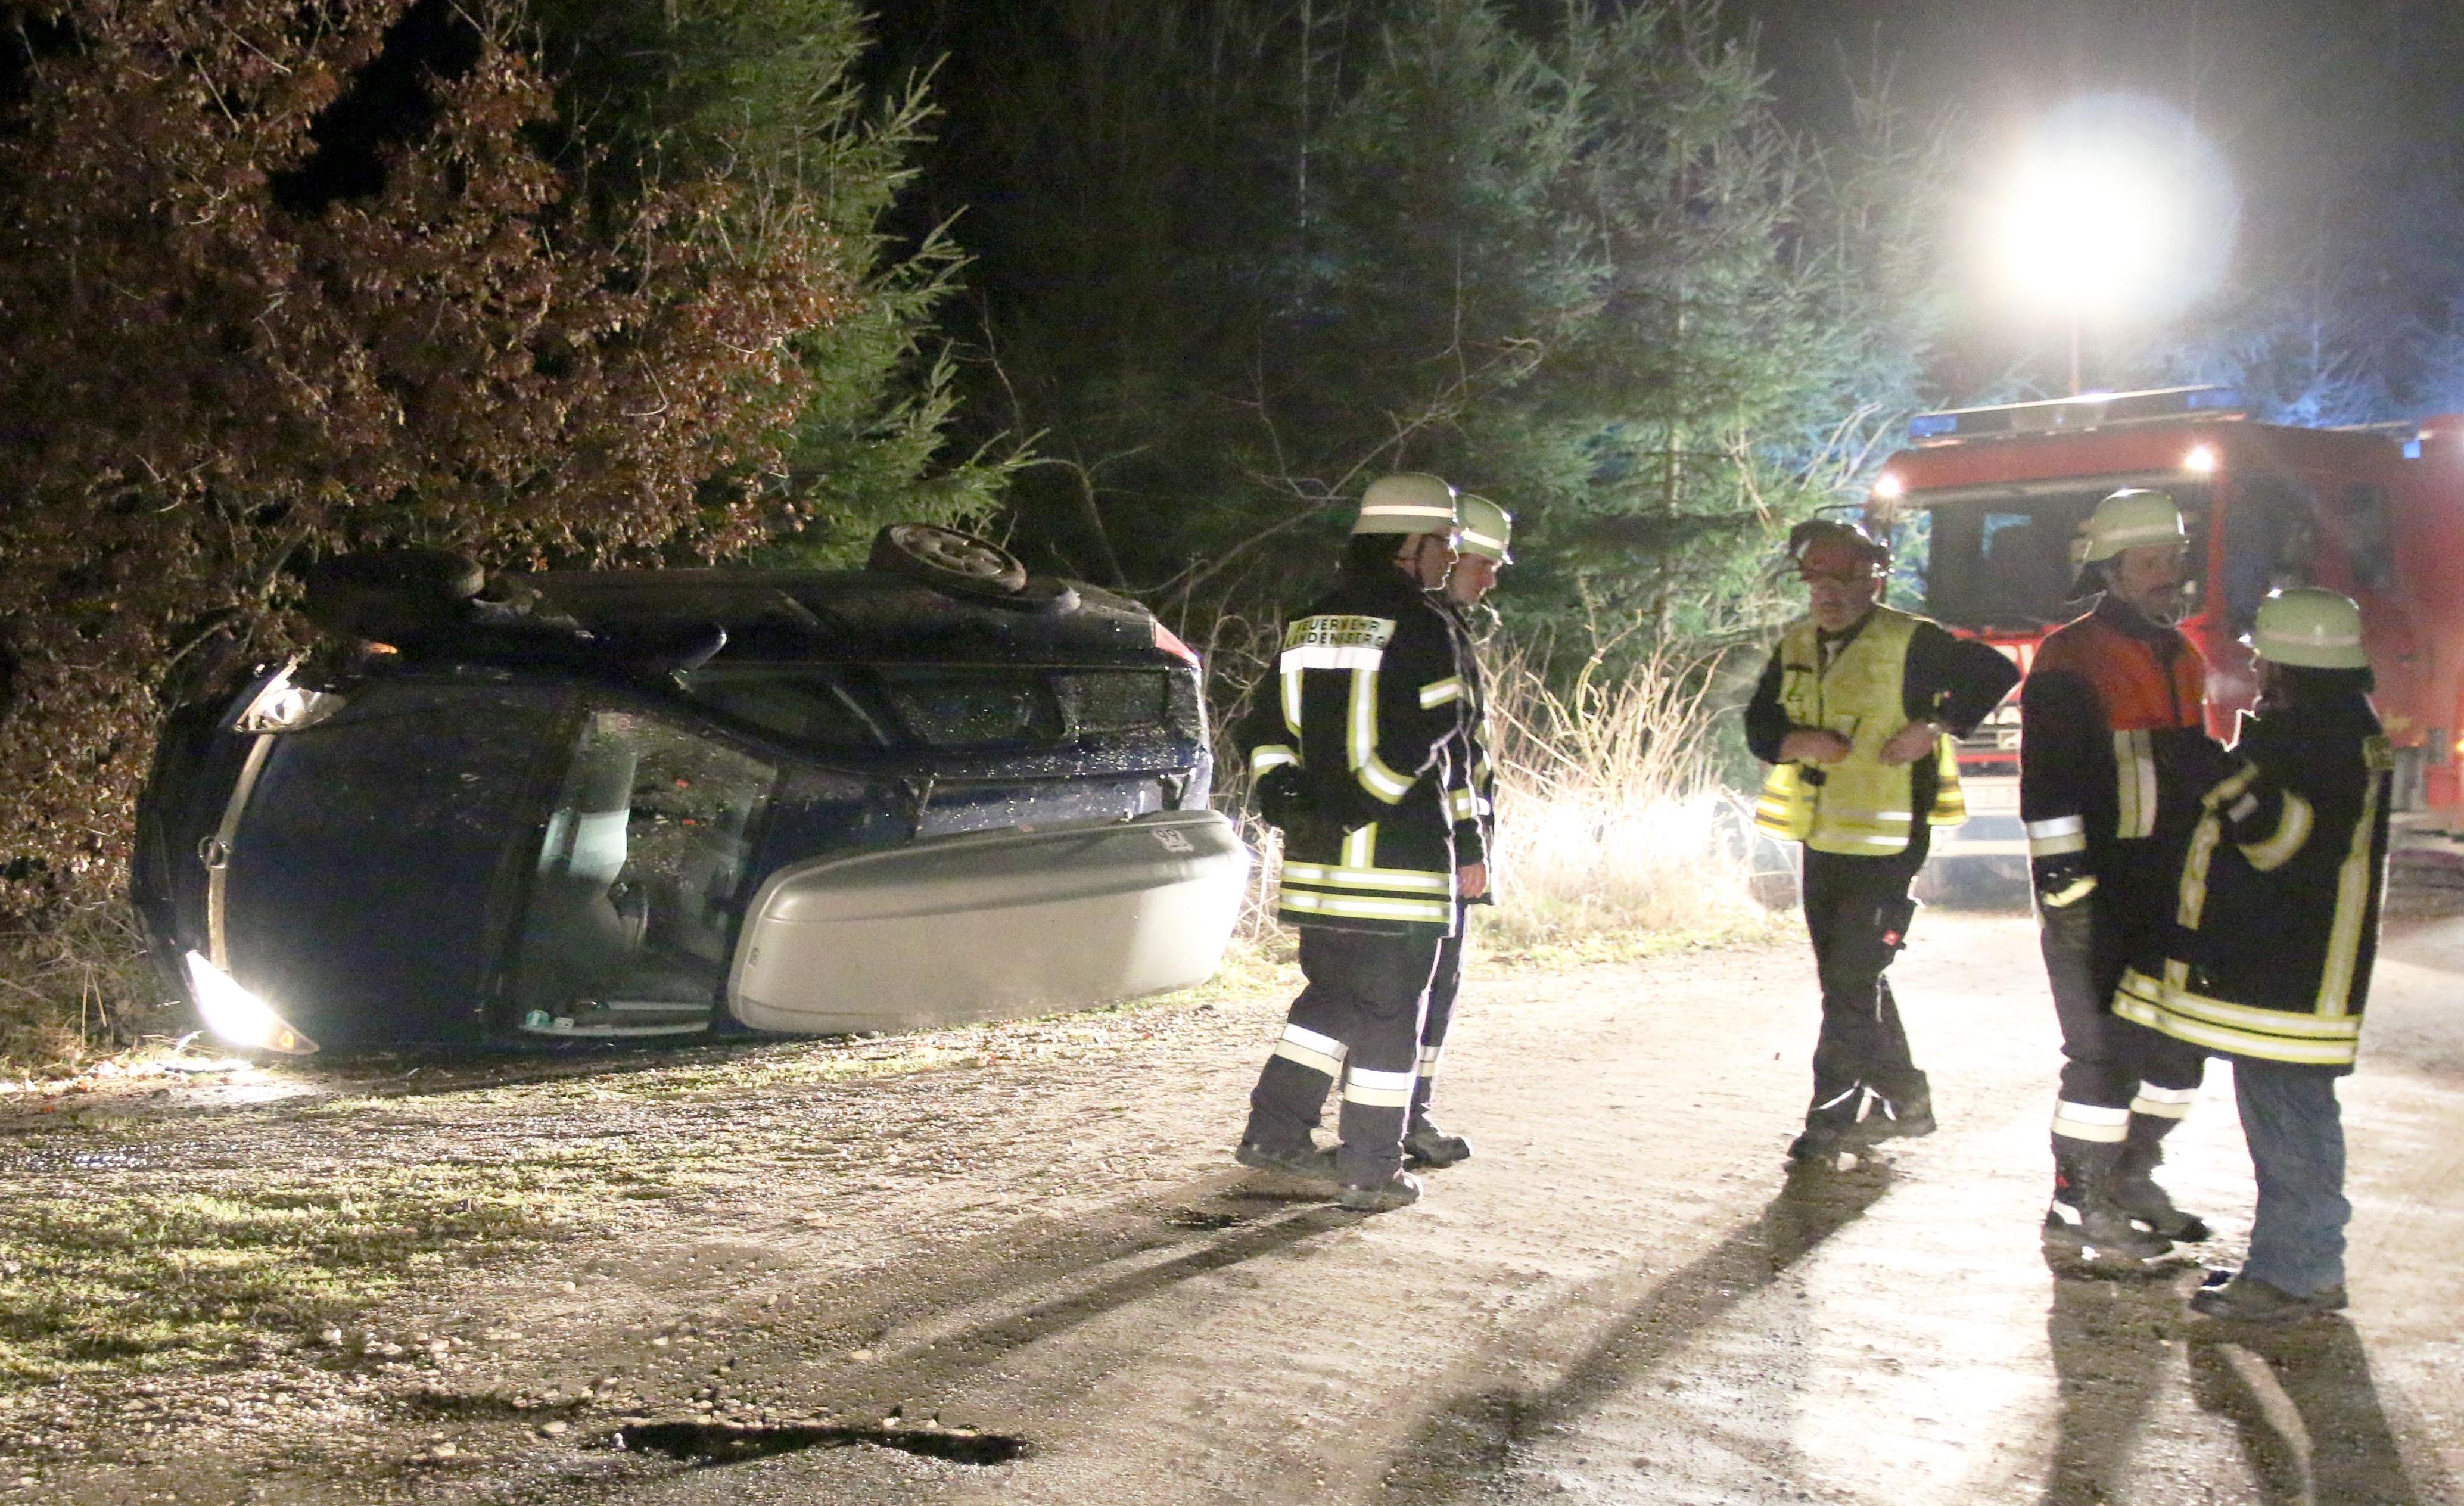 Bsaktuell, Verkehrsunfall Landensberg, Feuerwehr Landensberg, Schwaben Aktuell